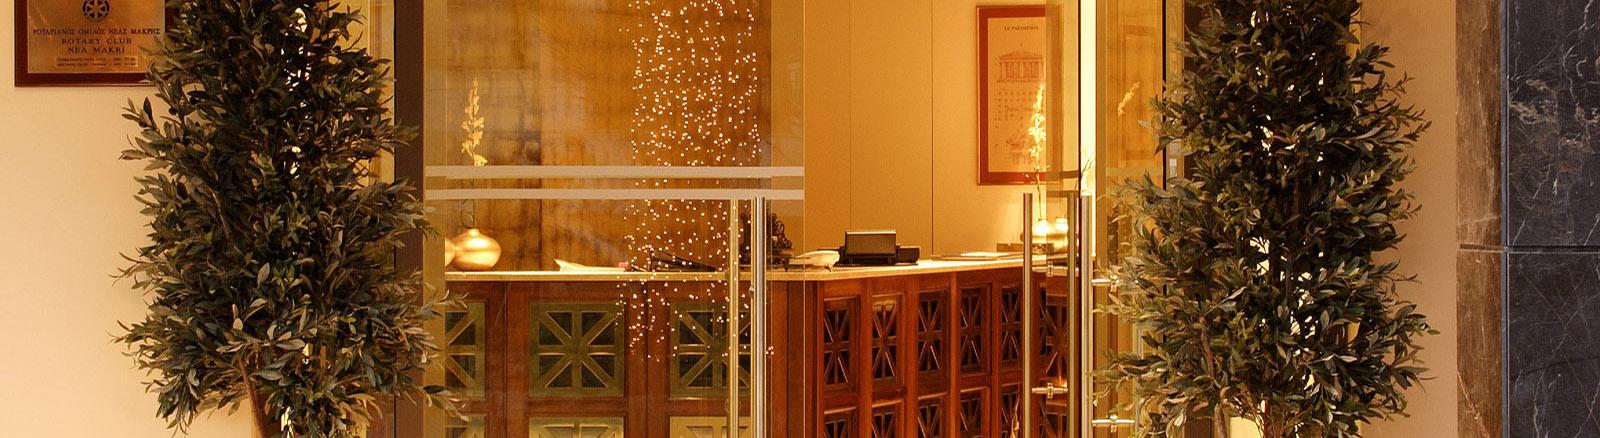 Mati hotel main entrance & reception